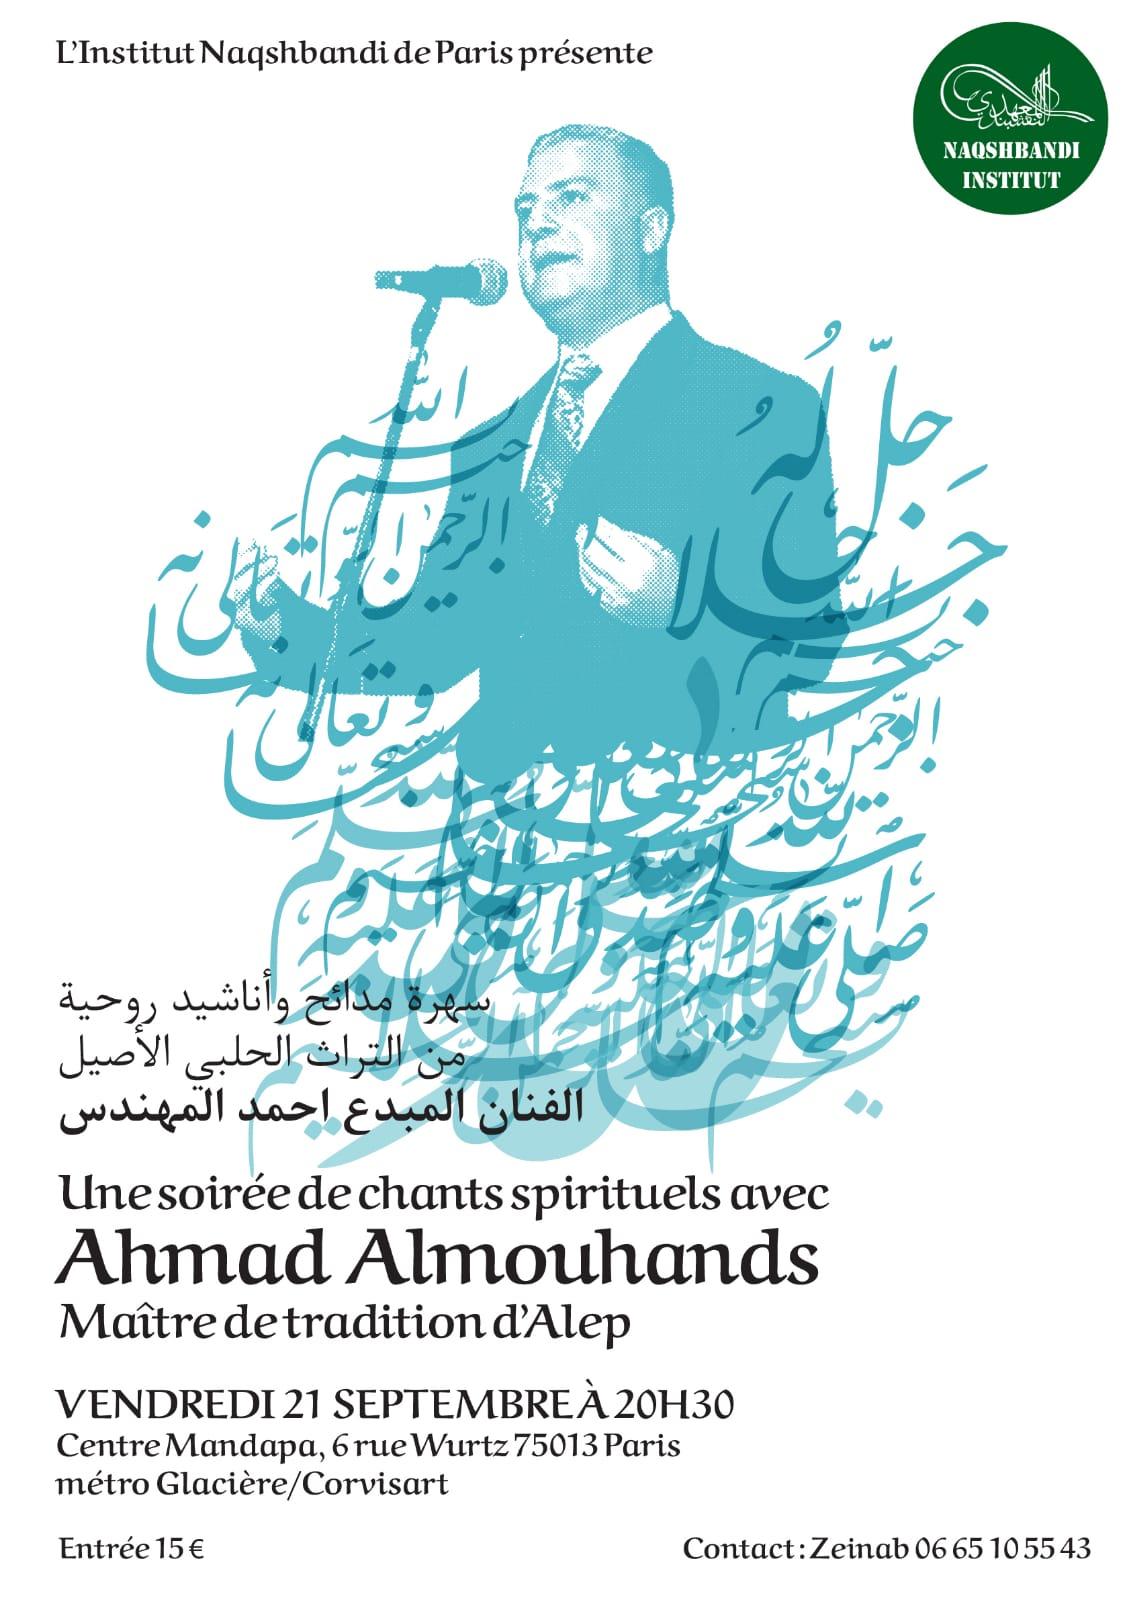 https://www.saphirnews.com/agenda/Soiree-musicale-de-chants-spirituels-d-Alep-avec-Ahmad-Almouhands_ae602573.html